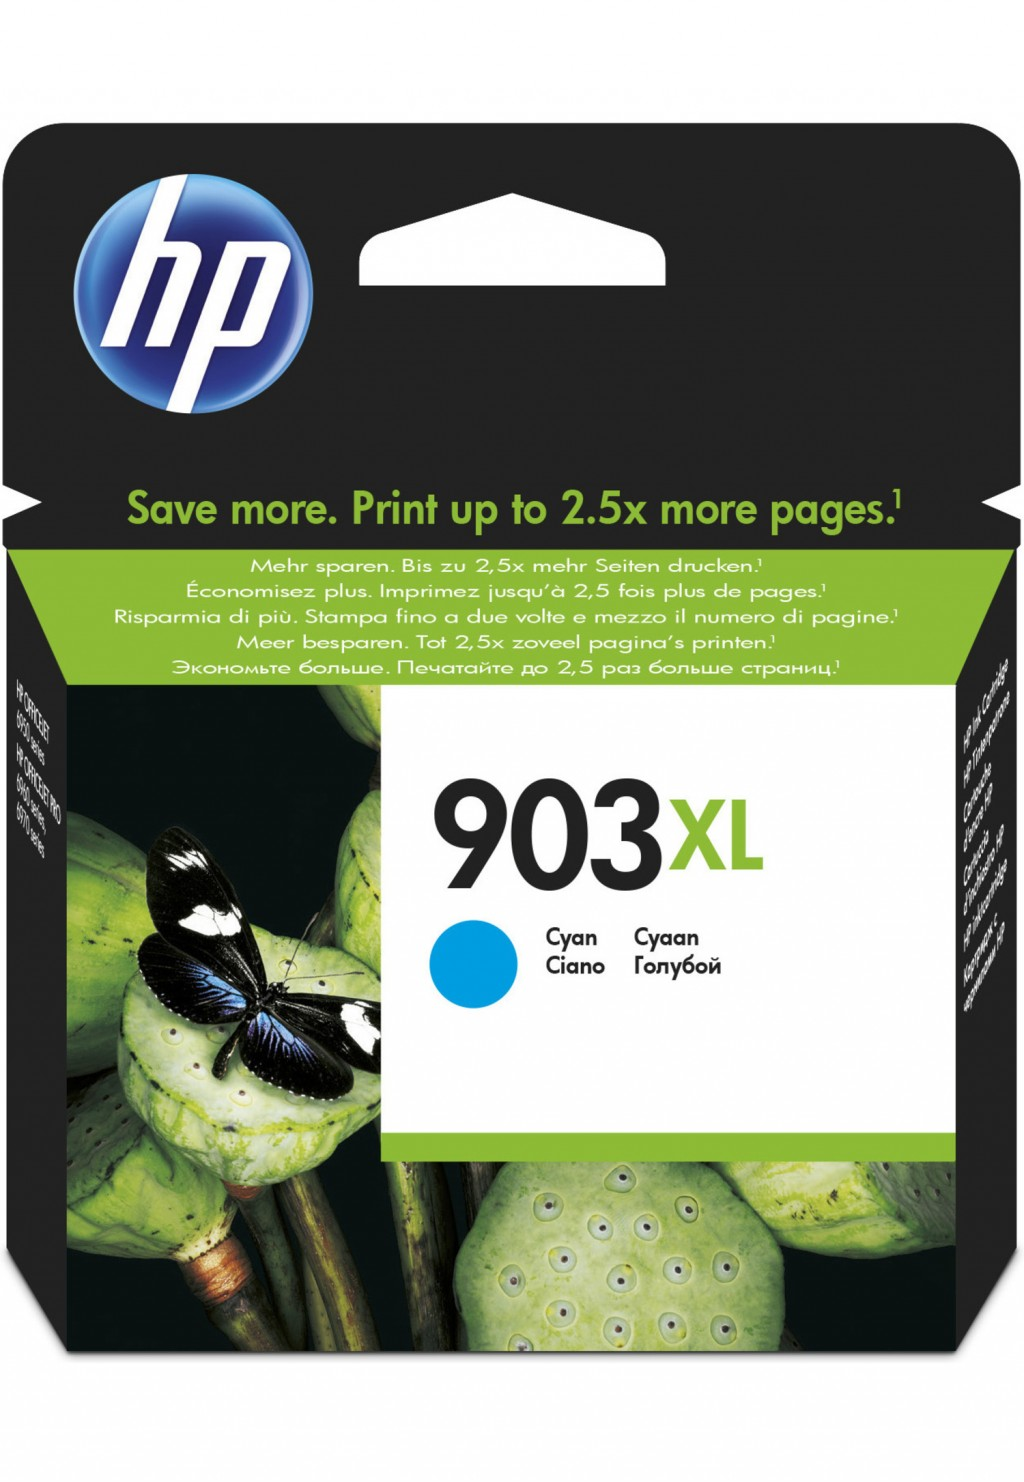 HP 903XL ink cartridge, cyan, high capacity